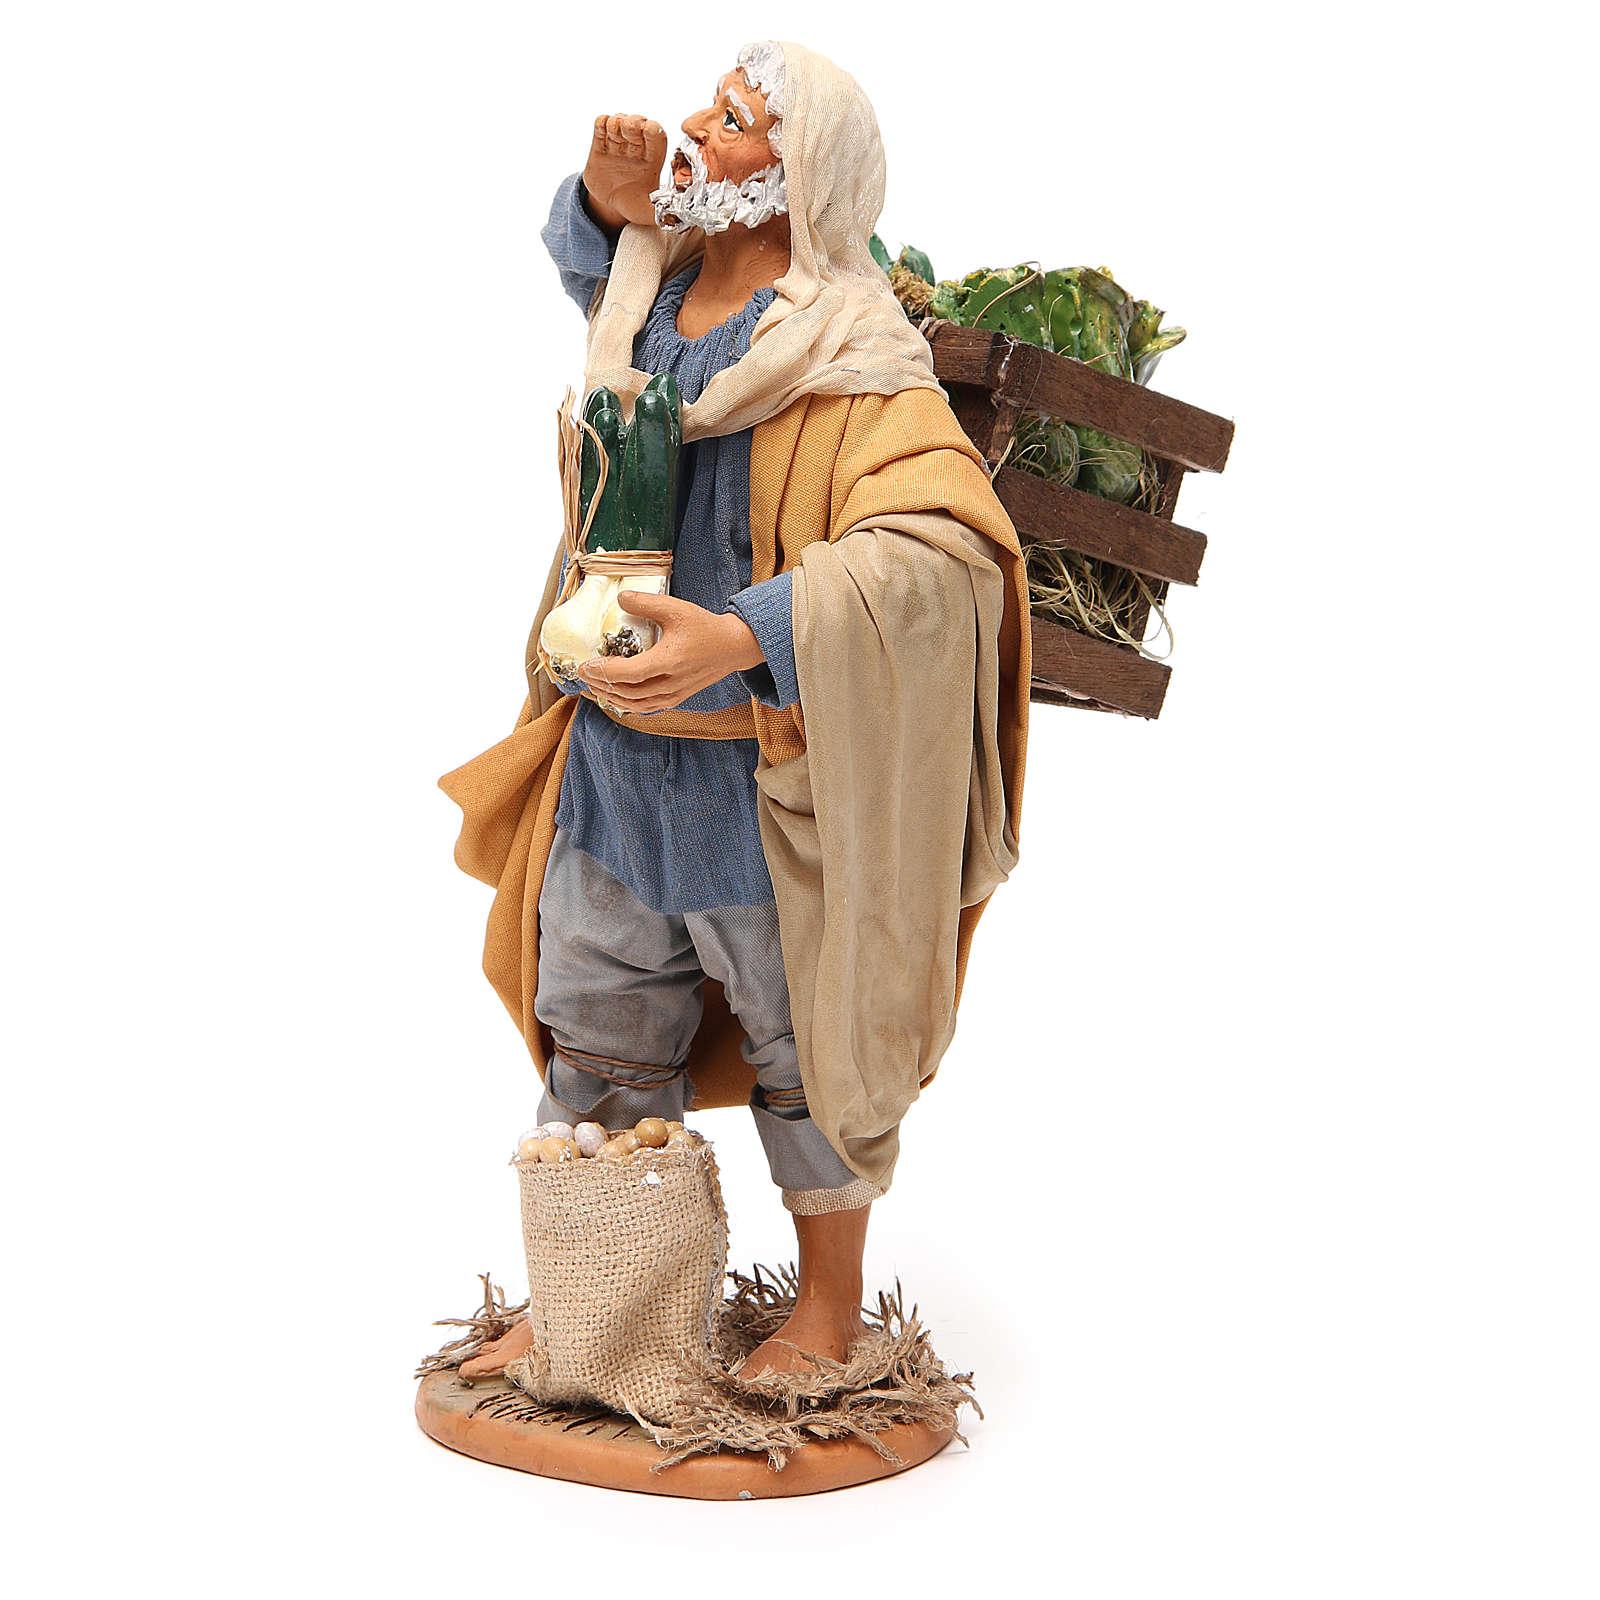 Uomo con verdura 30 cm presepe napoletano 4